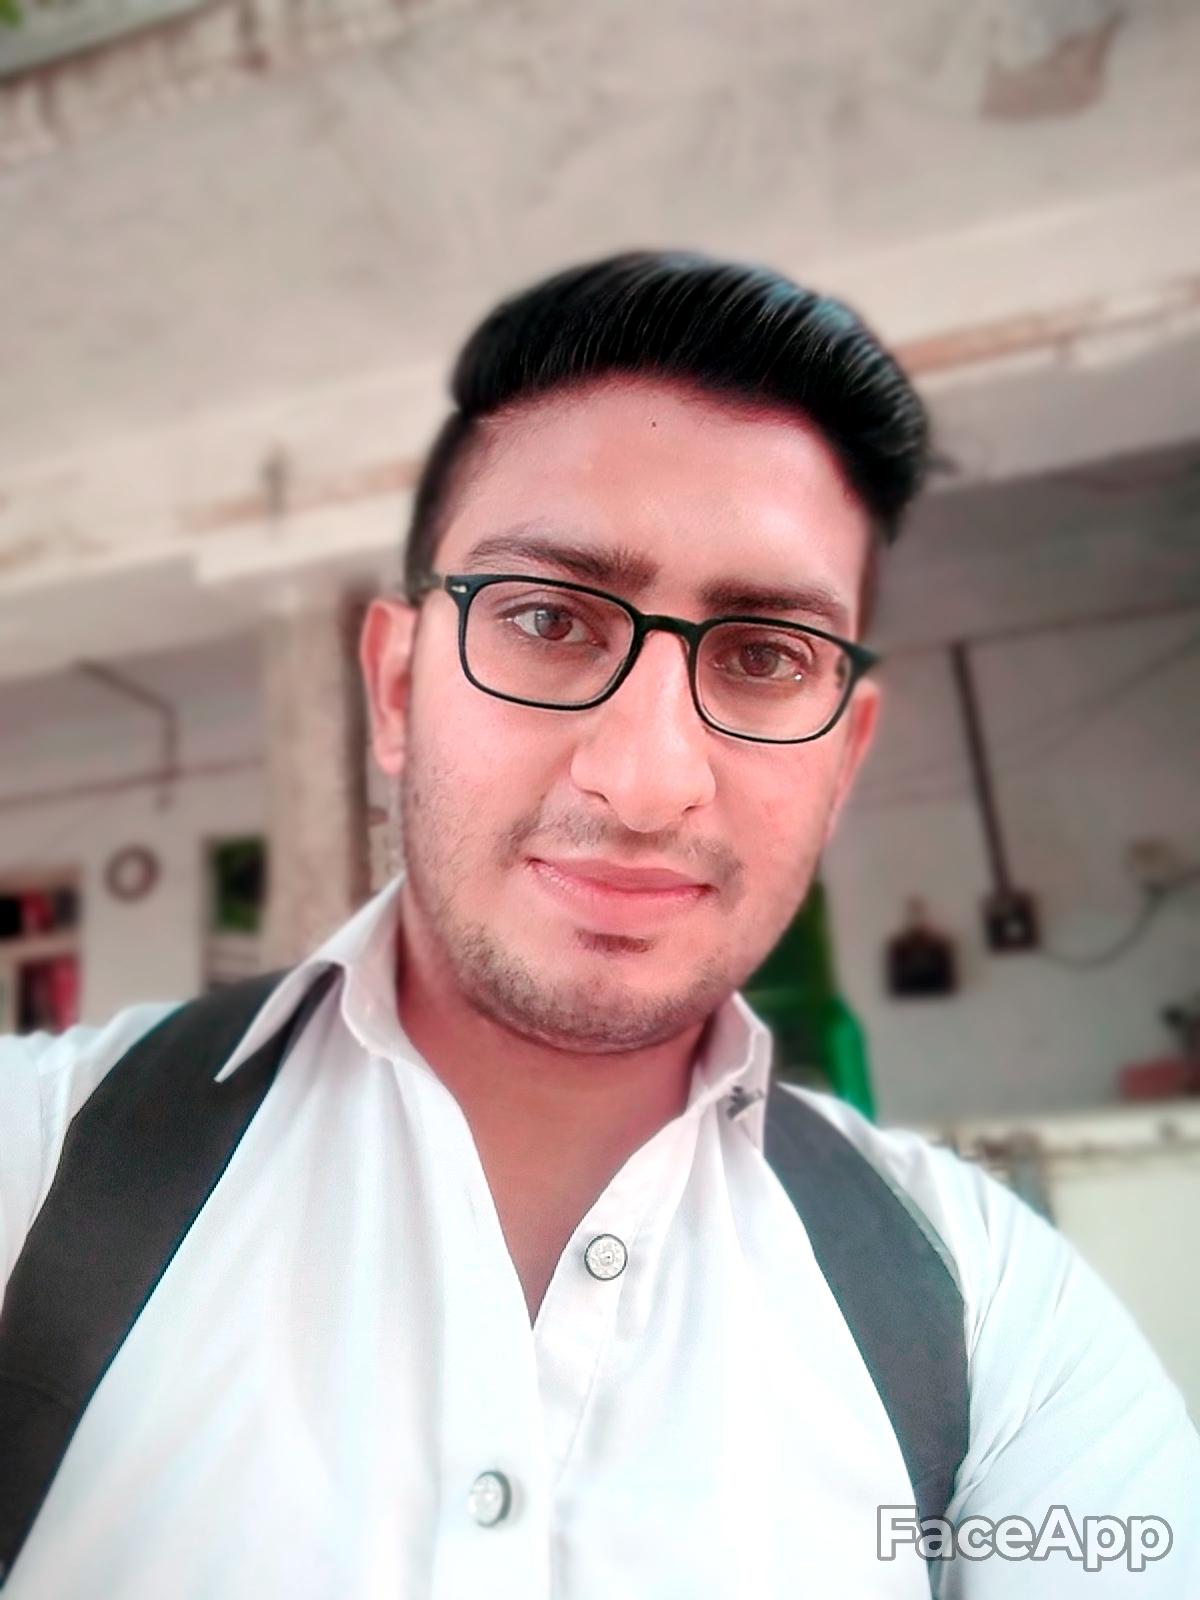 Rahid Hussain